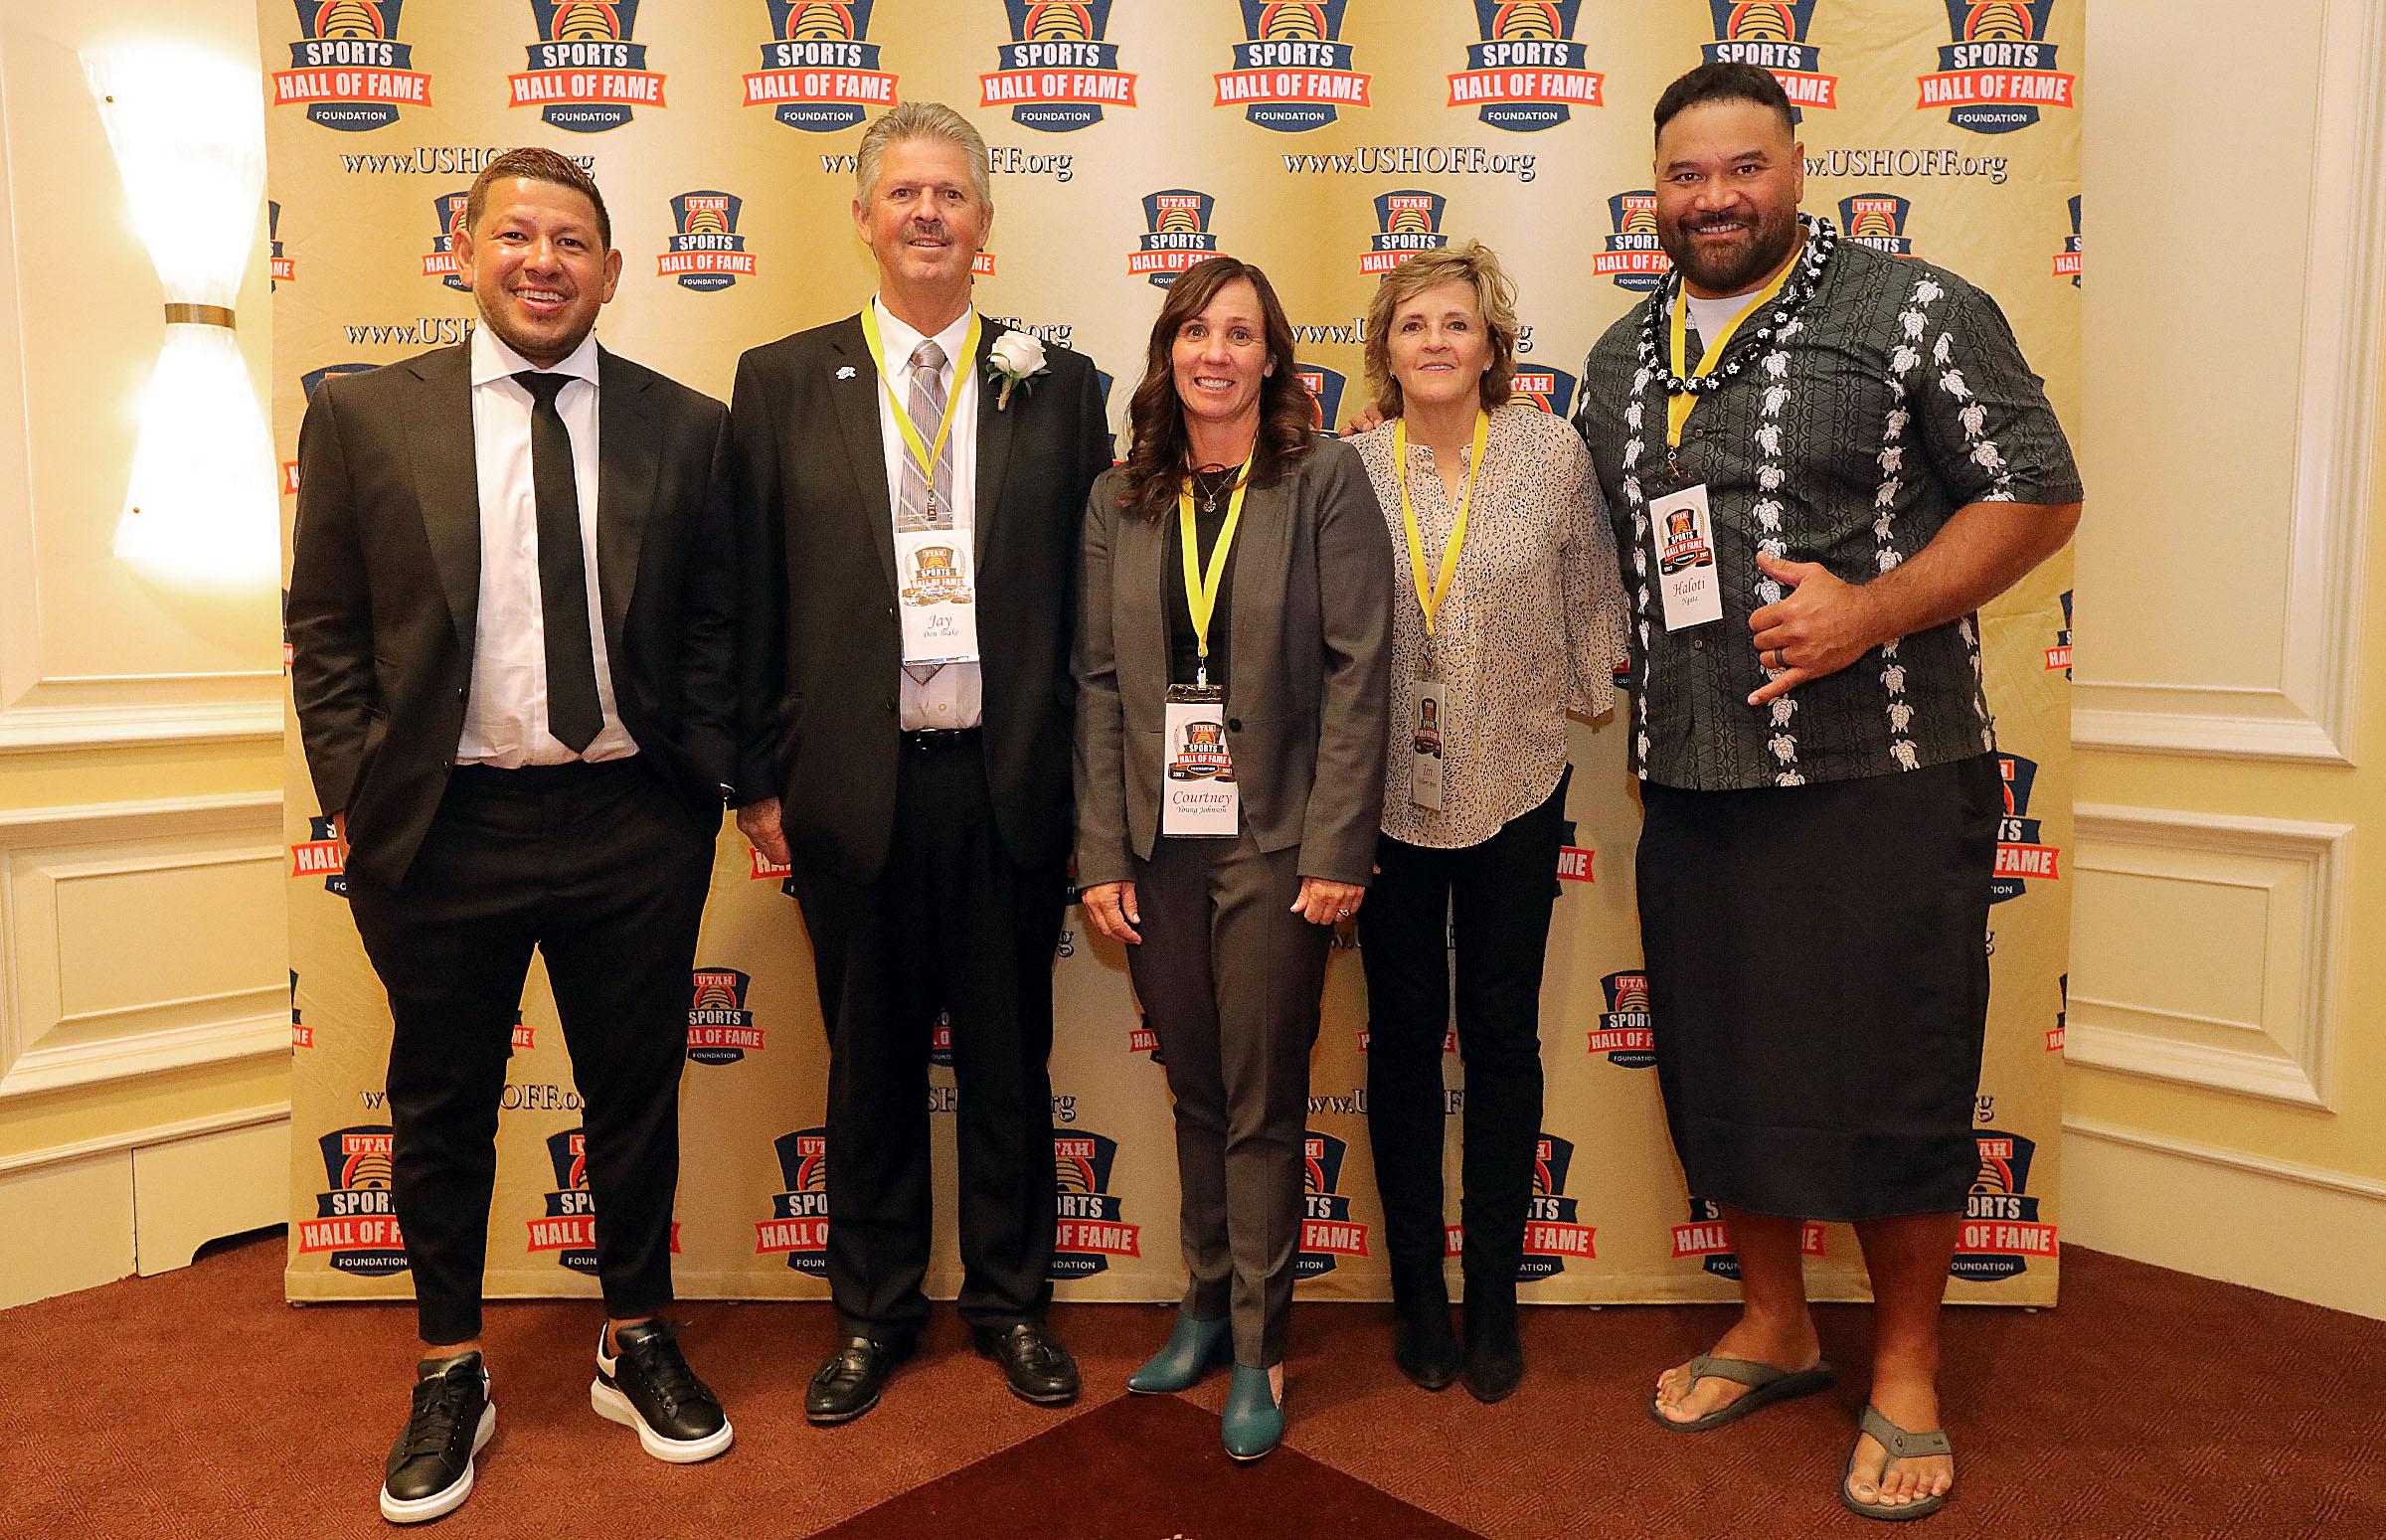 Nick Rimando, Jay Don Blake, Courtney Young Johnson, Teri Okelberry Spiers and Haloti Ngata pose for a photo